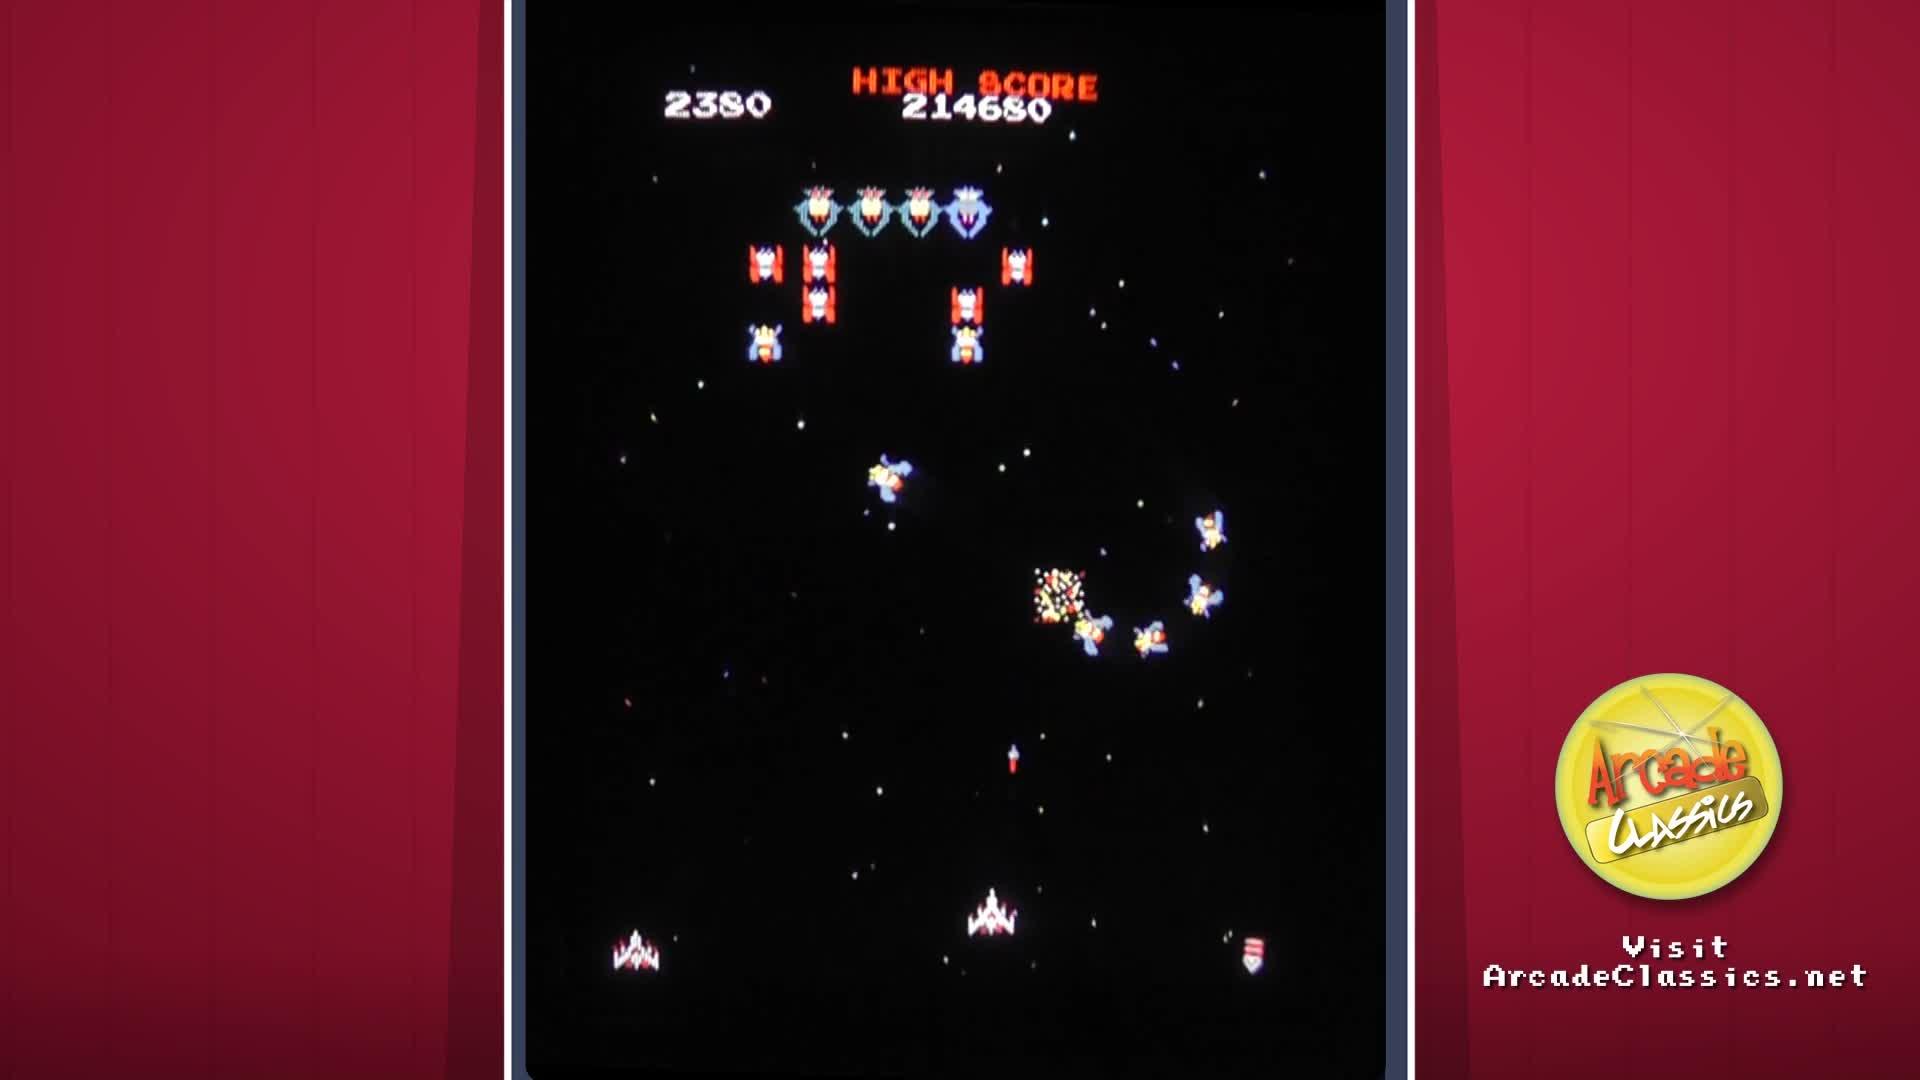 Galaga Arcade Game Video Watch at Y8